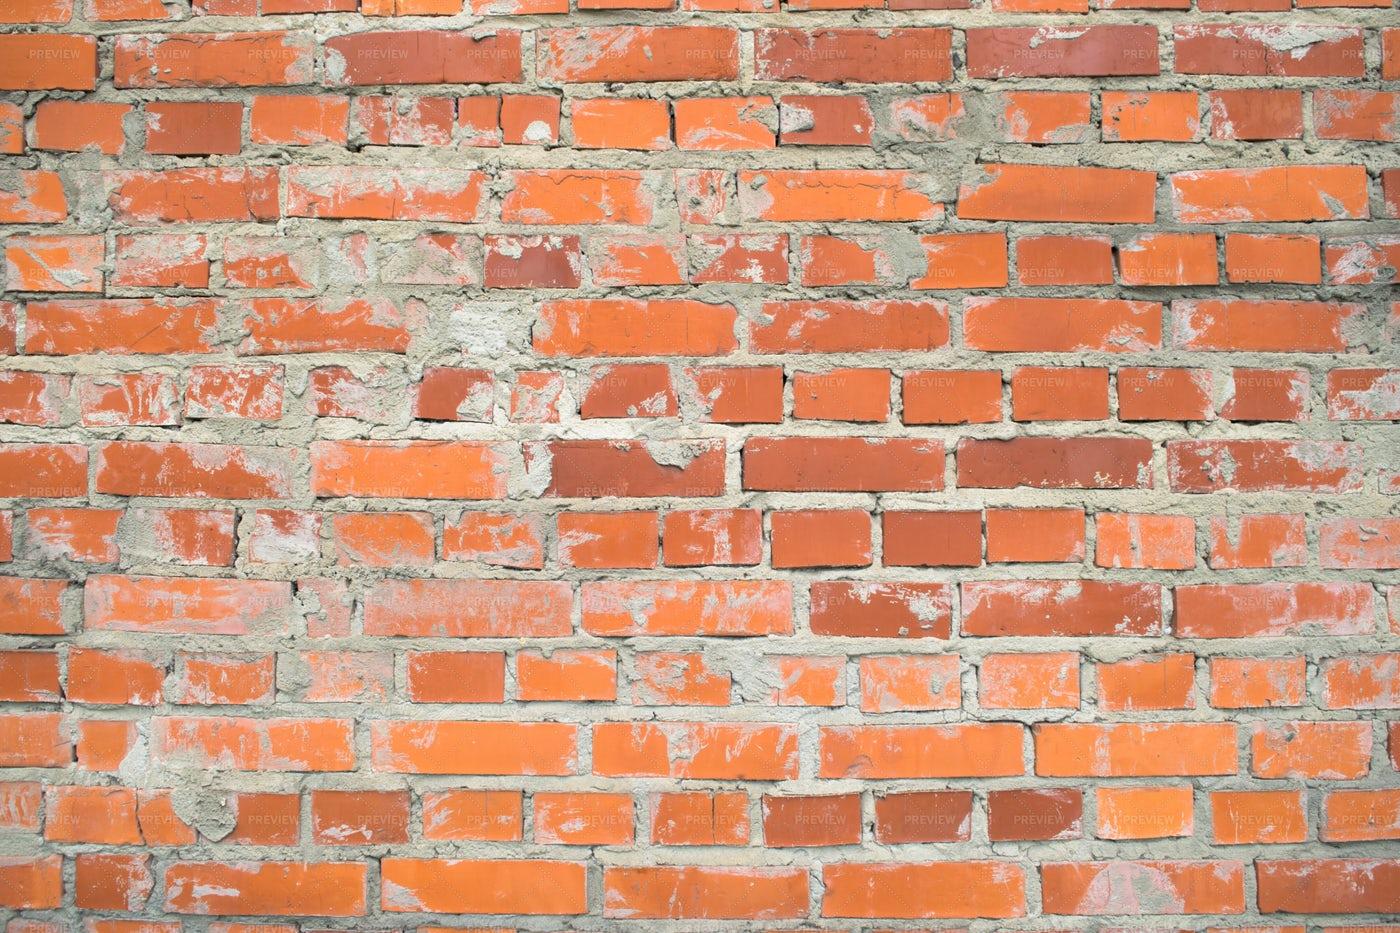 Red Brick Wall Texture: Stock Photos